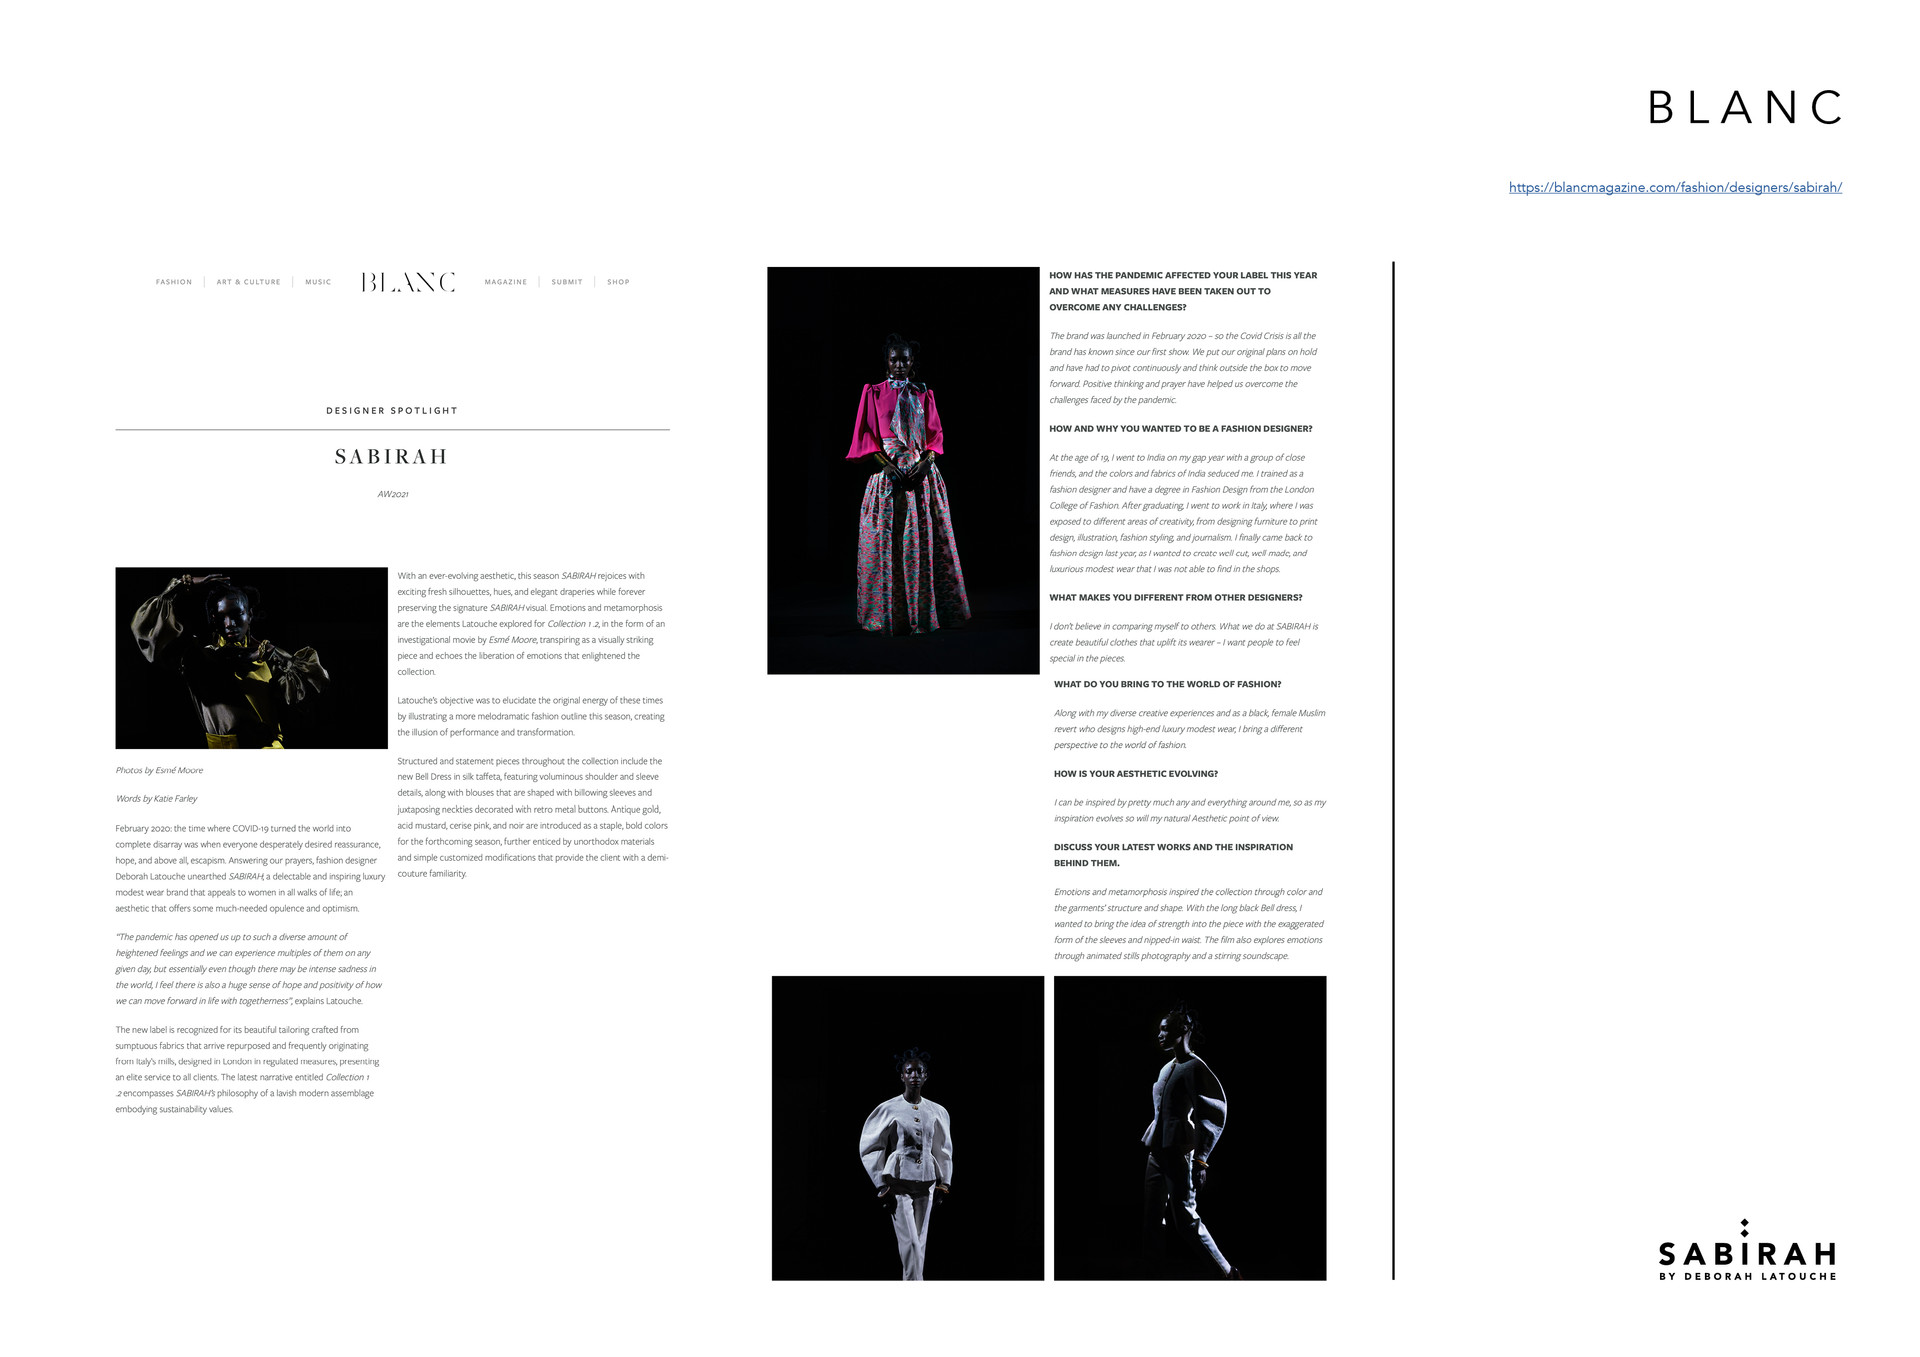 Sabirah_press book3.jpg